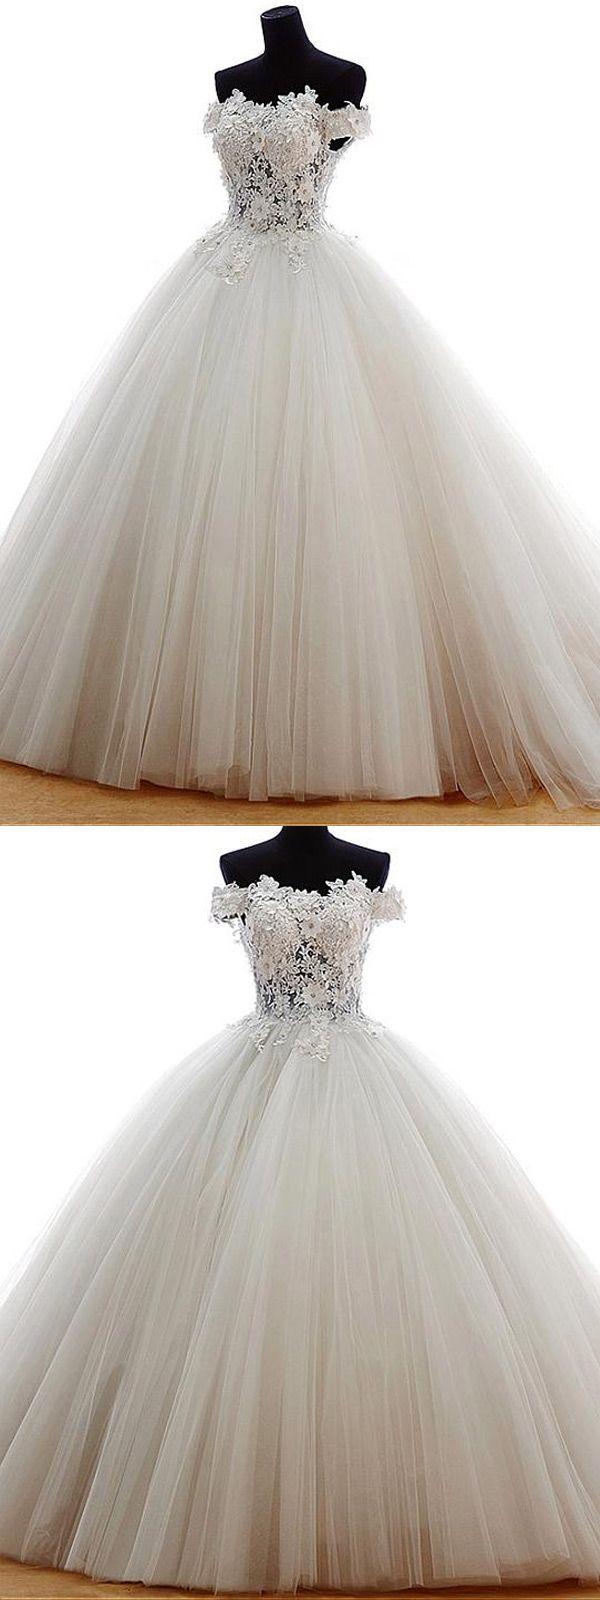 Marvelous tulle offtheshoulder neckline ball gown wedding dress